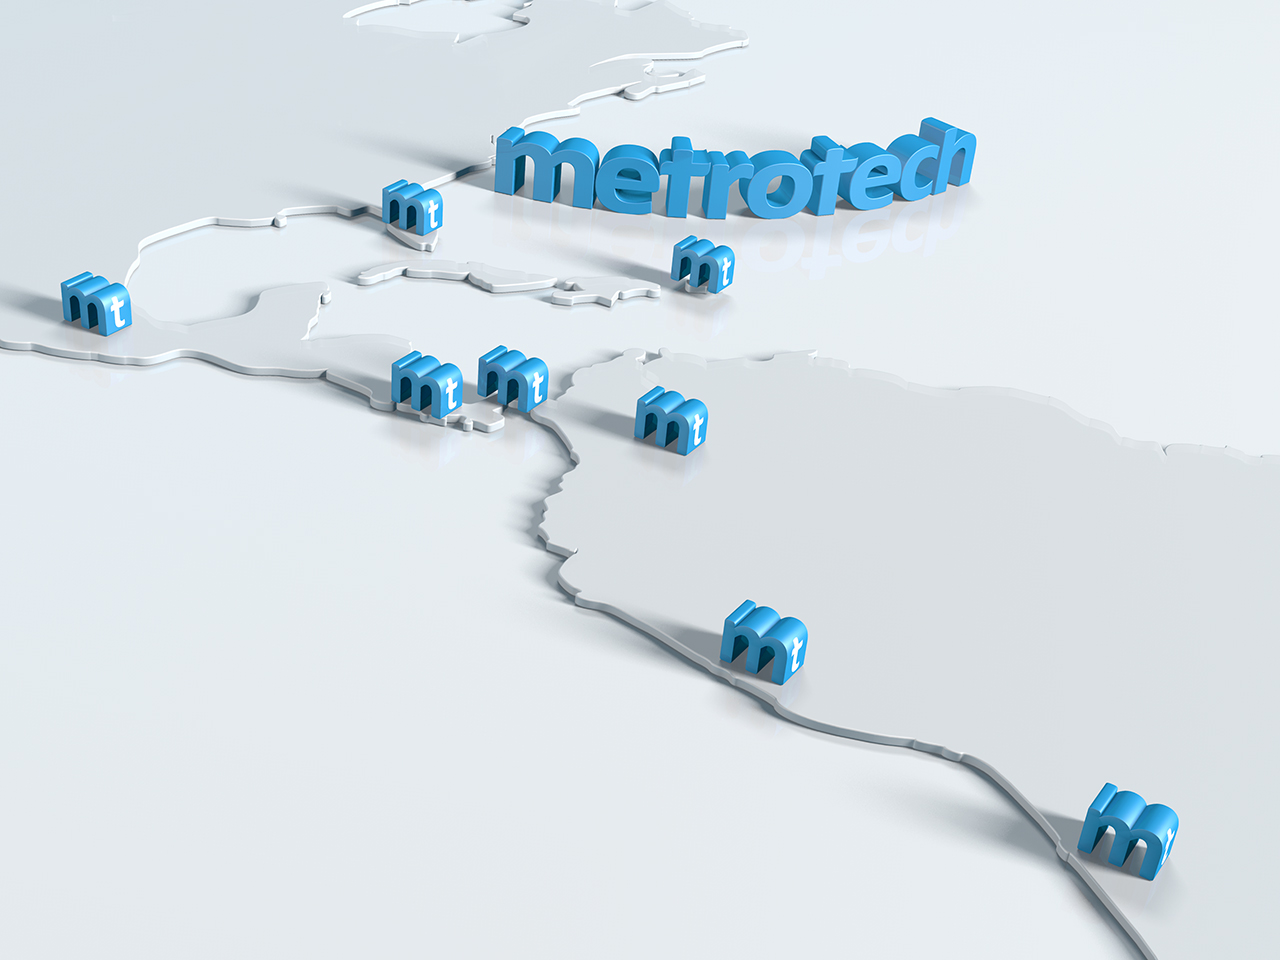 Metrotech